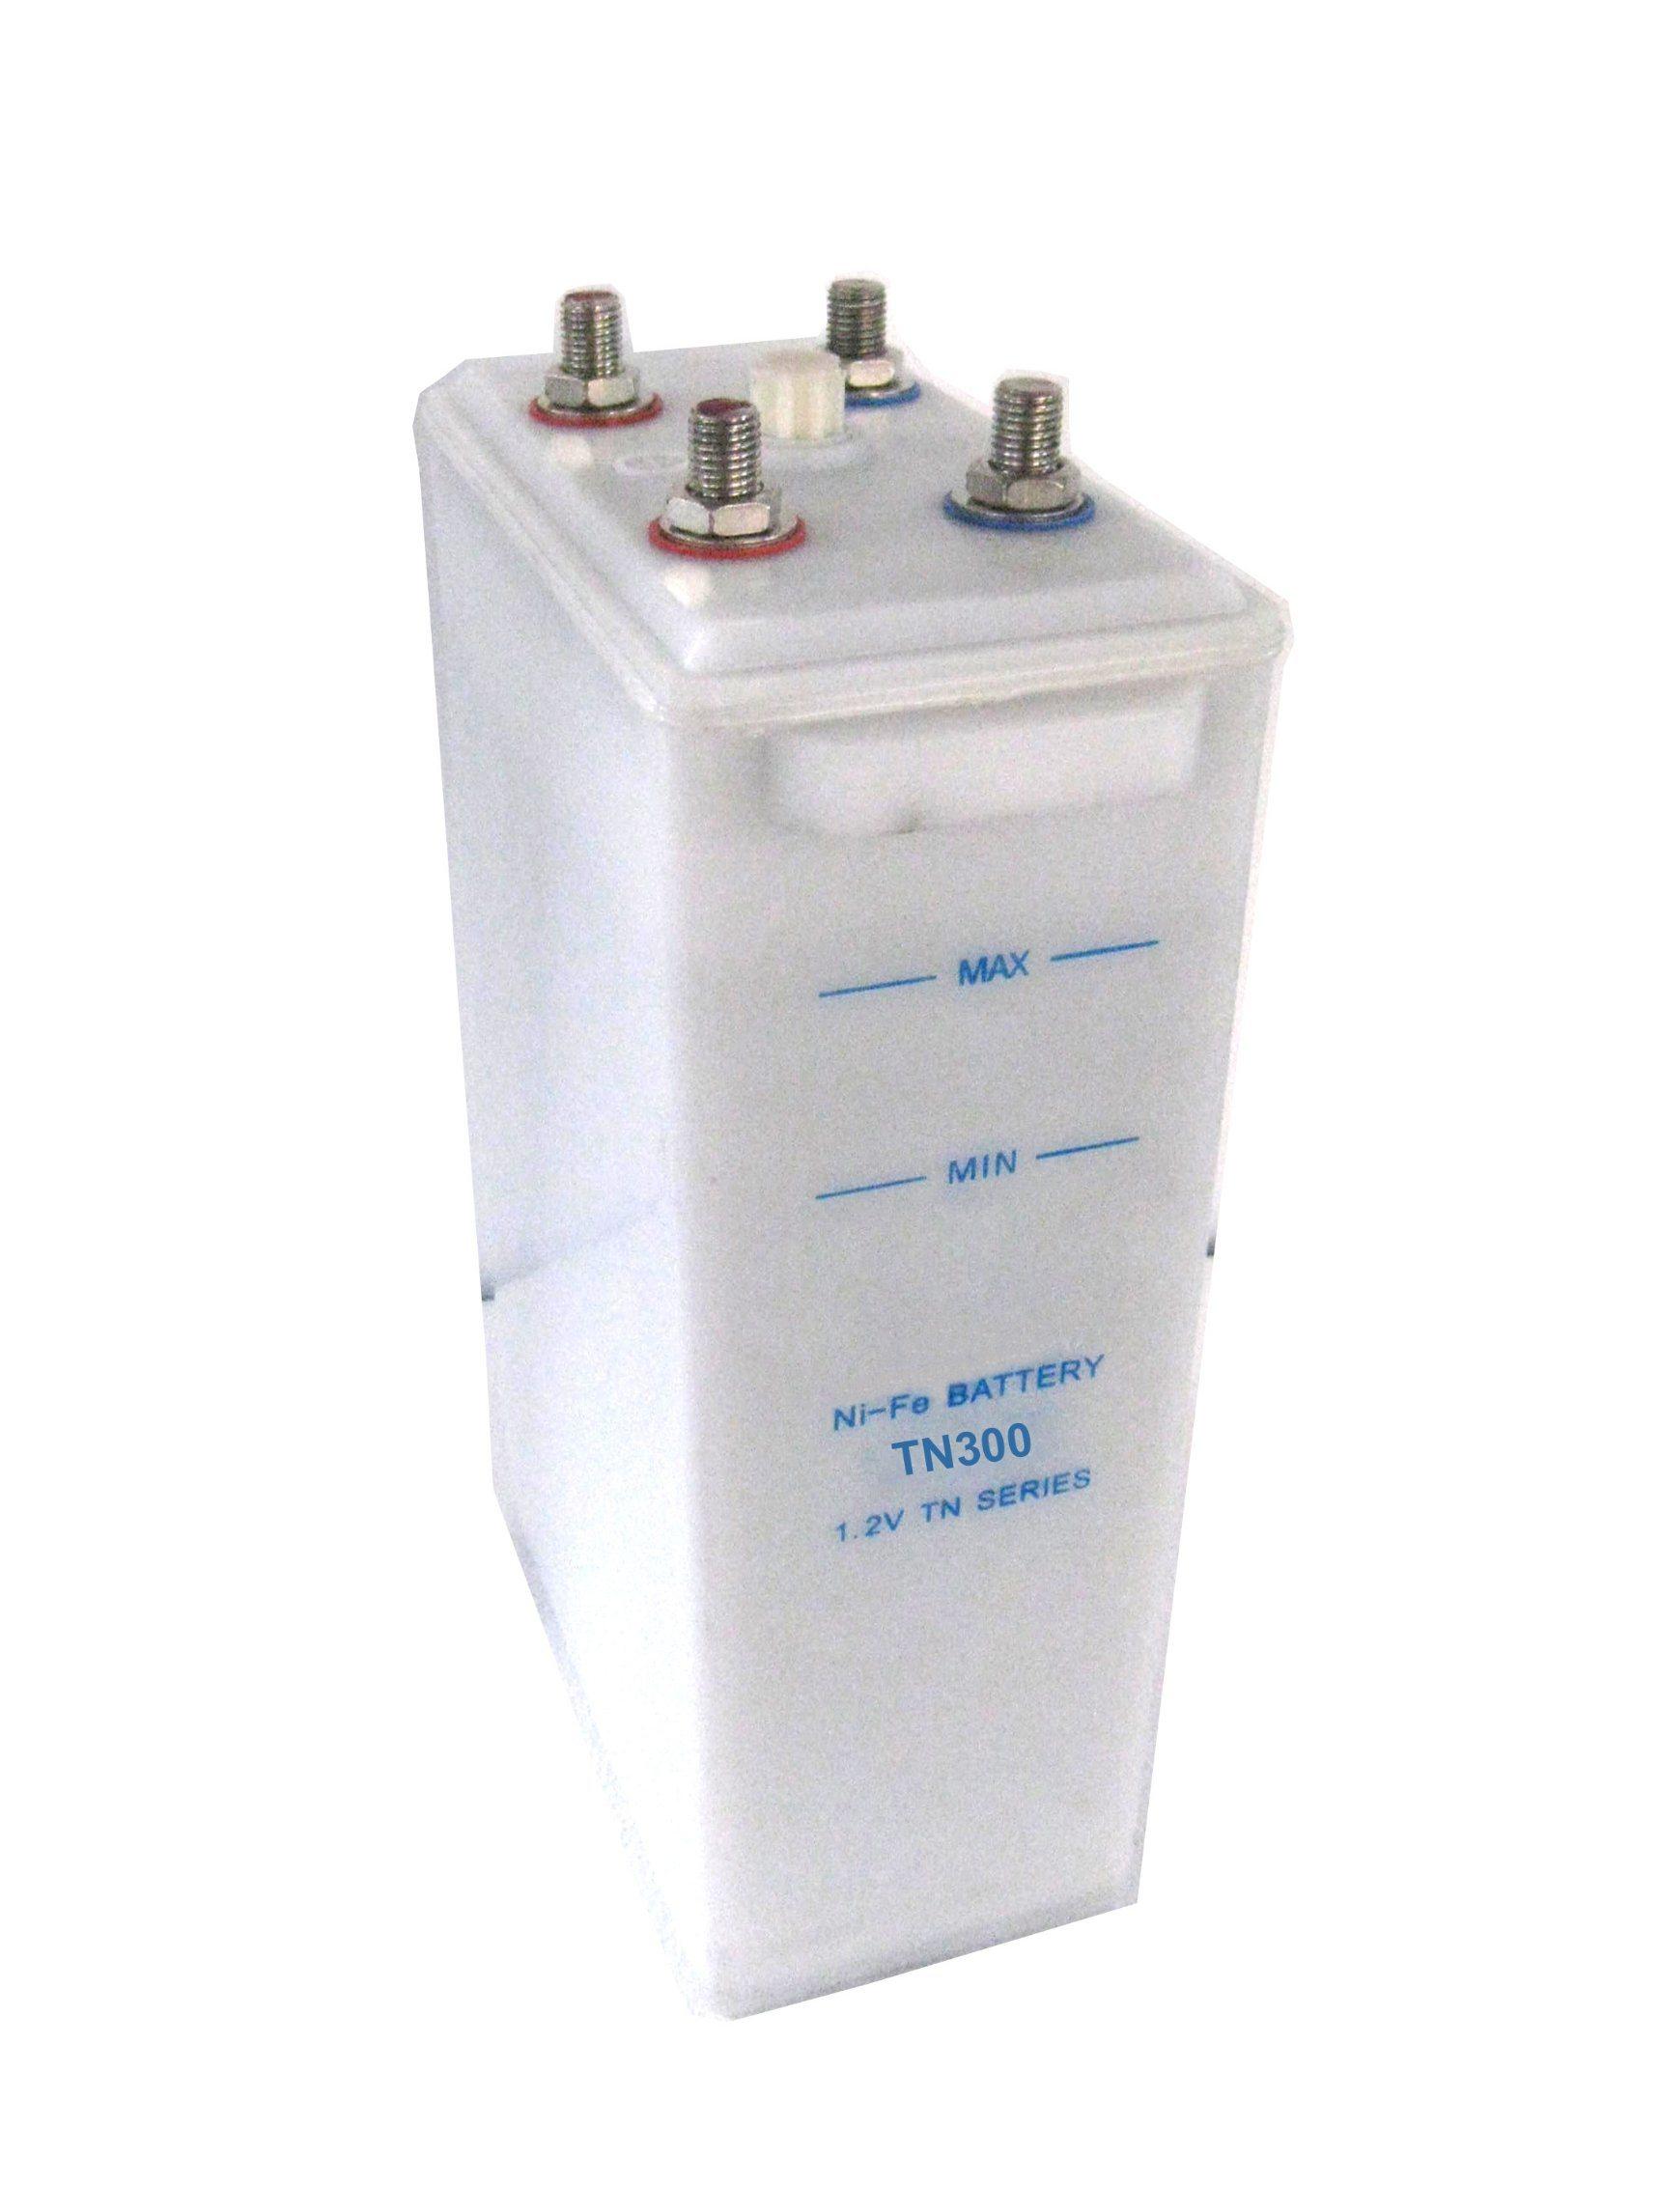 Solar System Ni-Fe Battery Nickel Iron Nife Batteries 1.2V 300ah